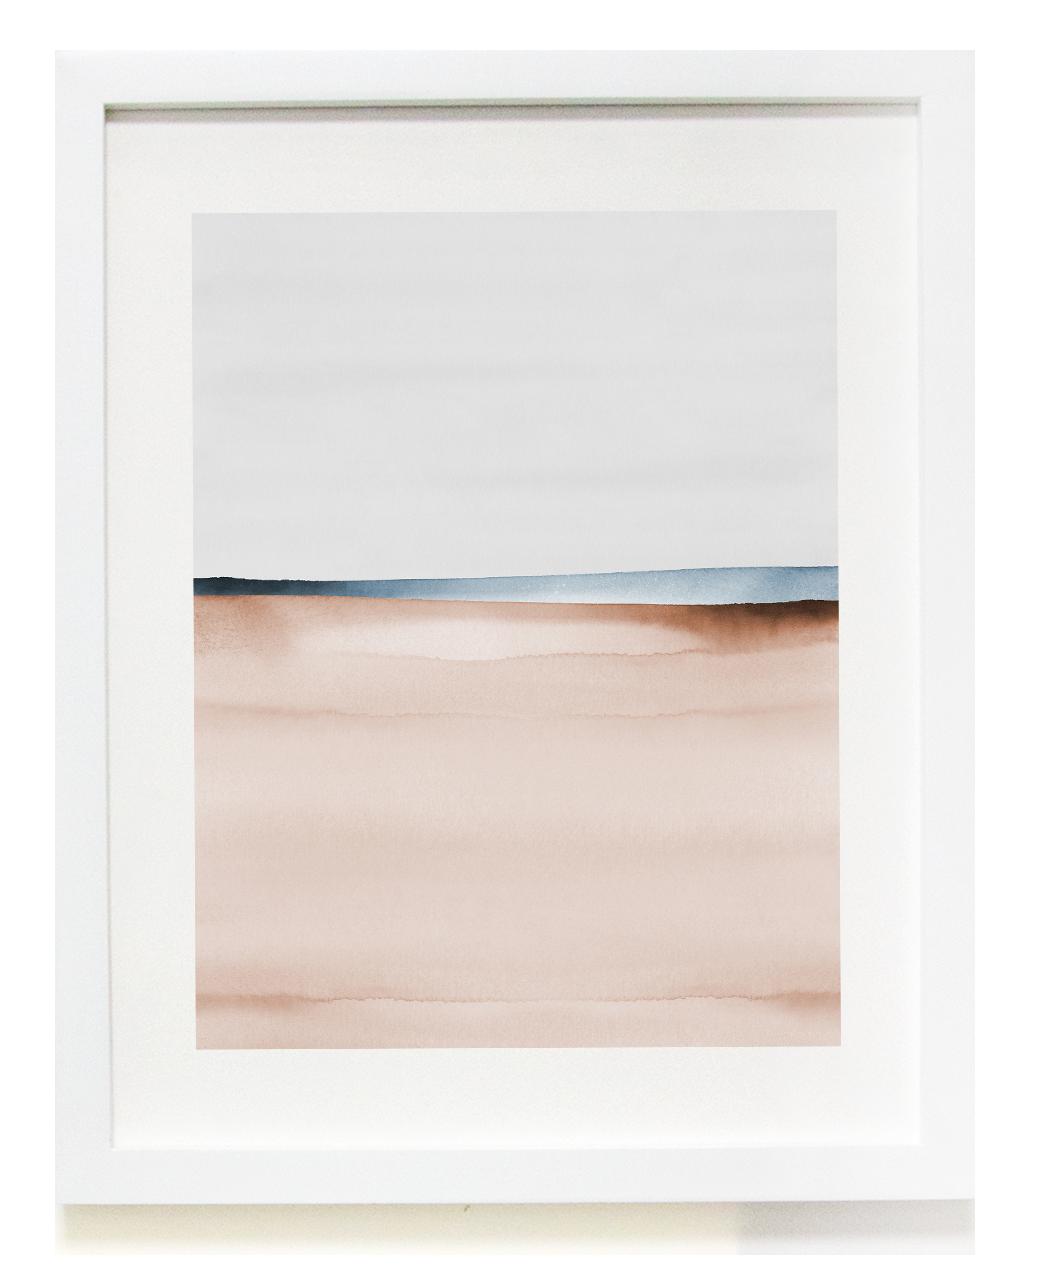 frame-1-B.png